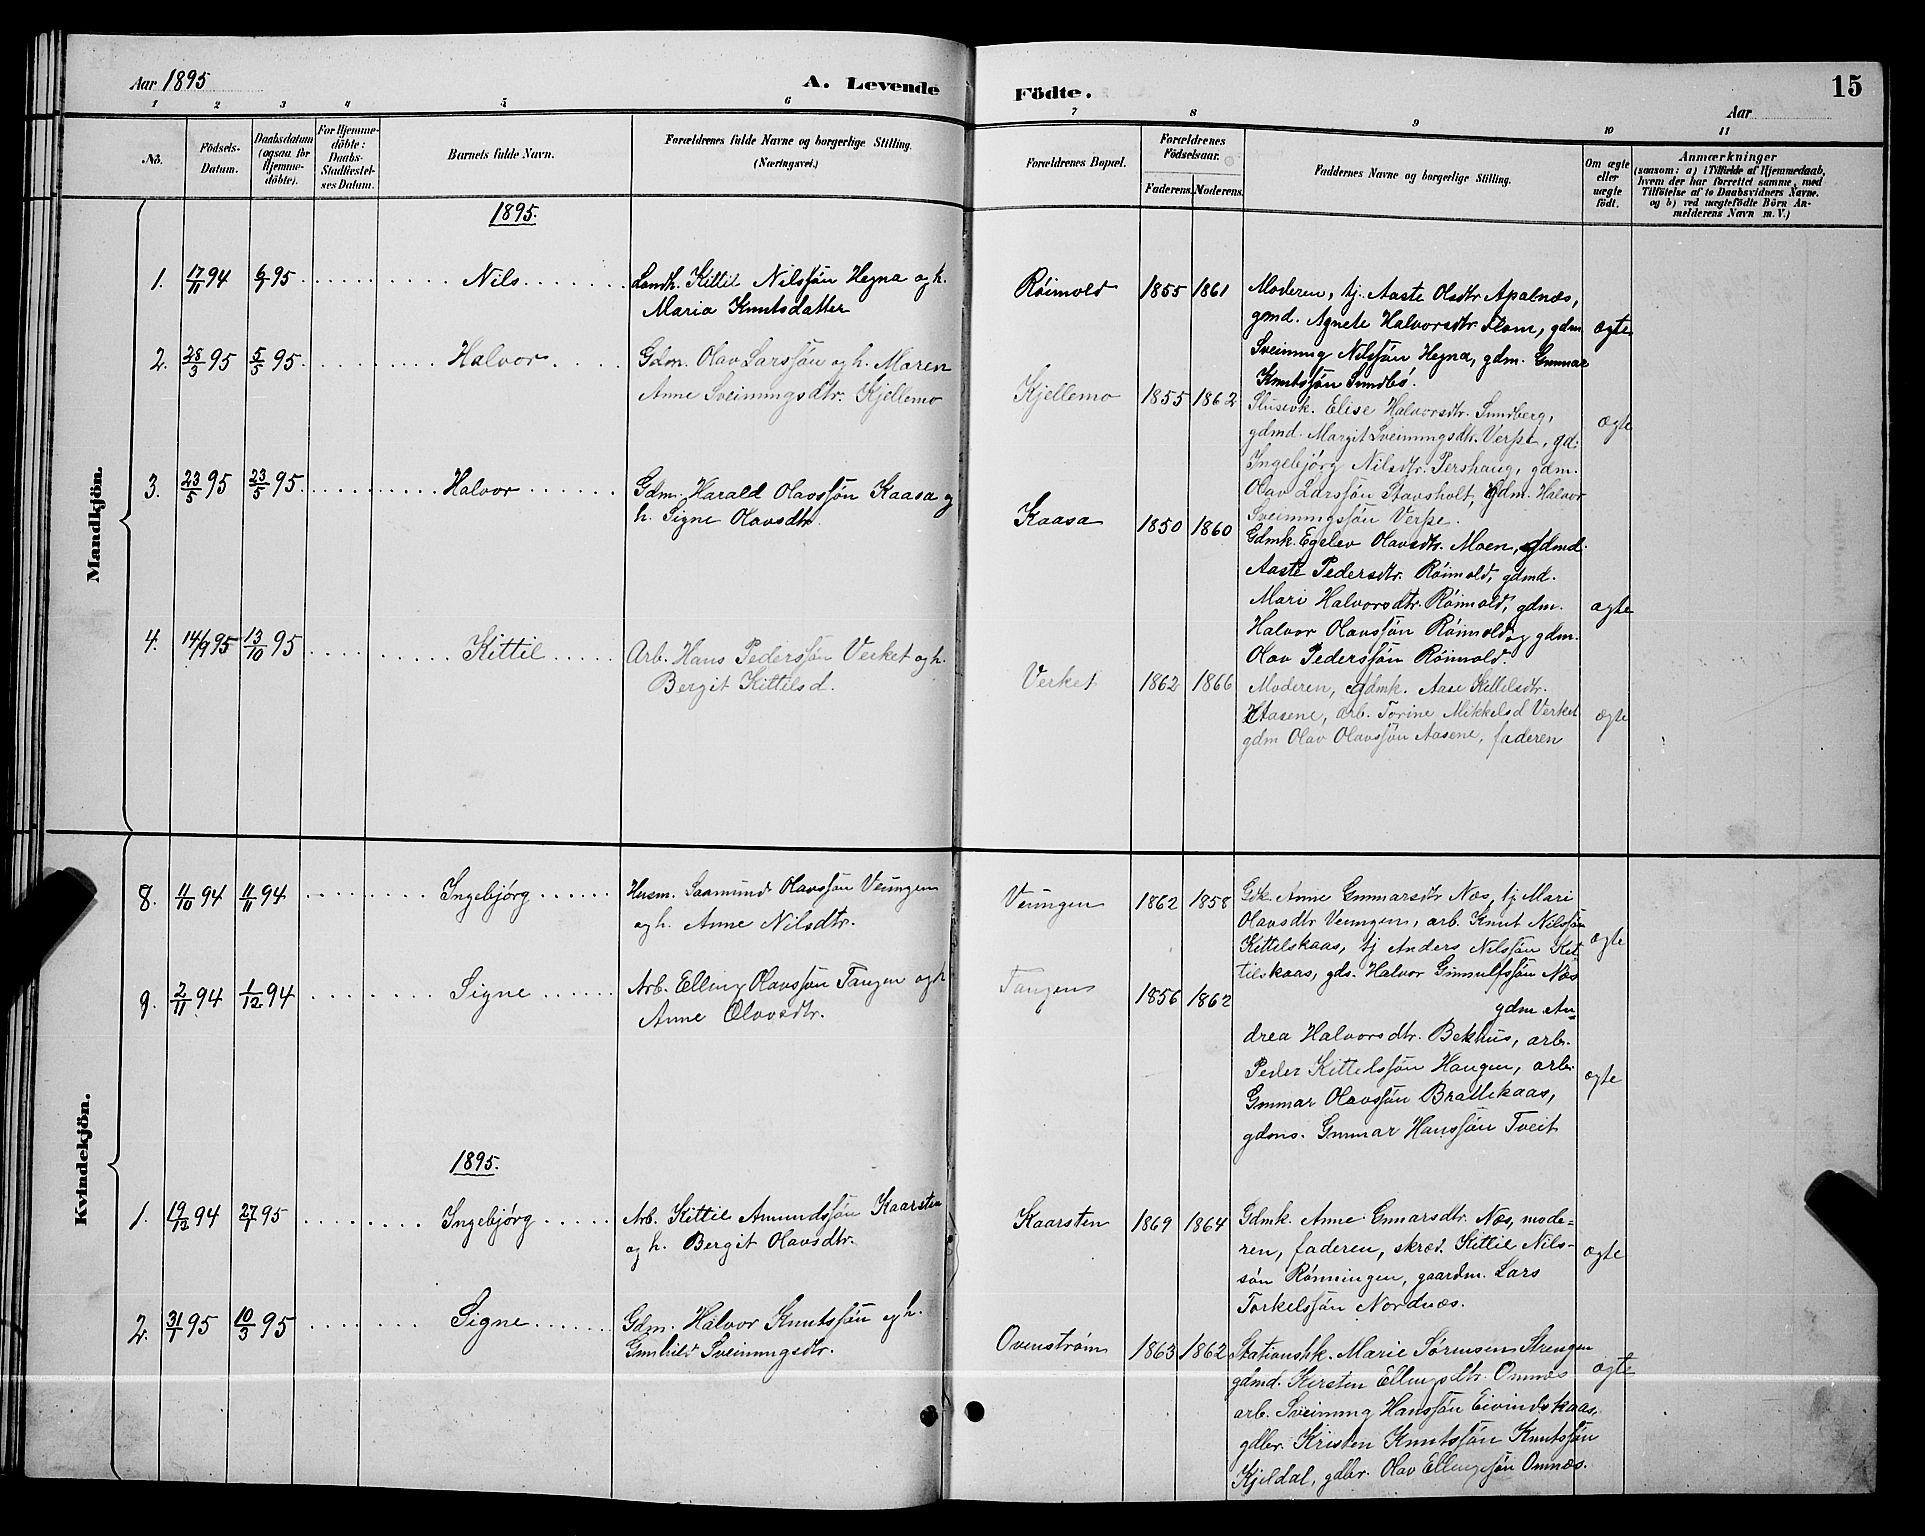 SAKO, Lunde kirkebøker, G/Gb/L0002: Klokkerbok nr. II 2, 1888-1895, s. 15